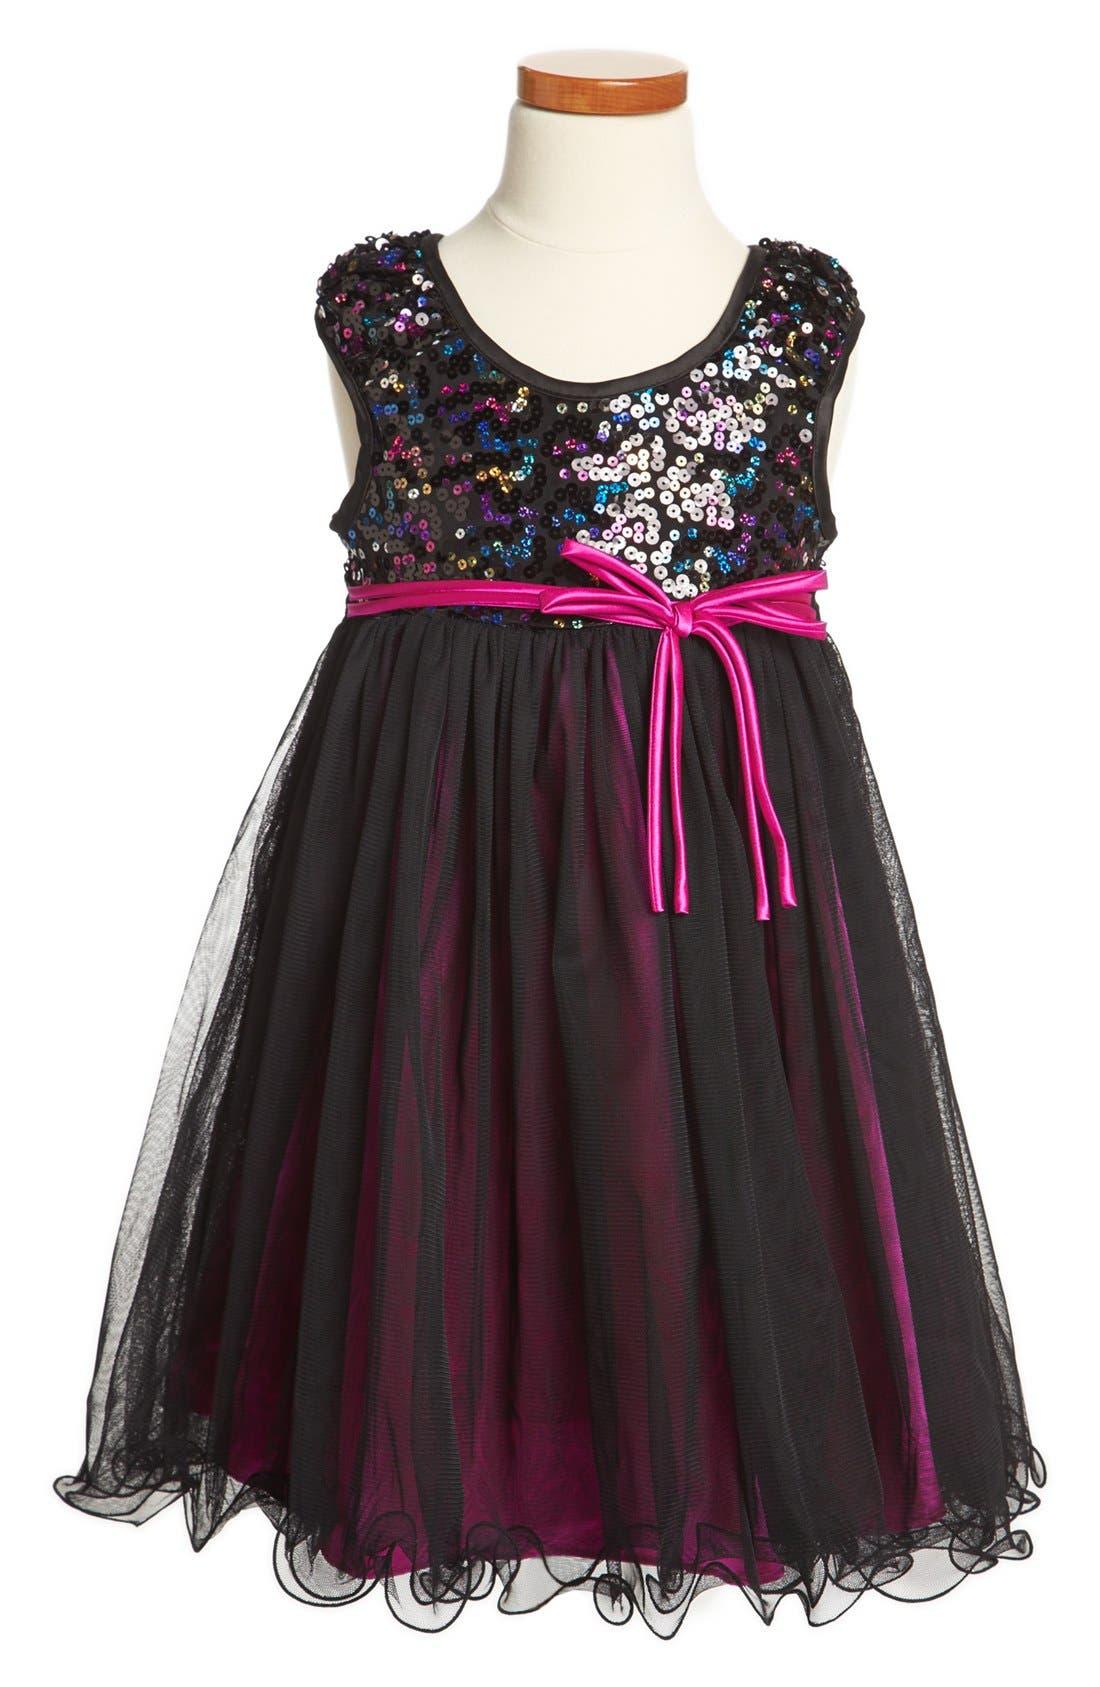 Alternate Image 1 Selected - Iris & Ivy Sequin Dress (Little Girls & Big Girls)